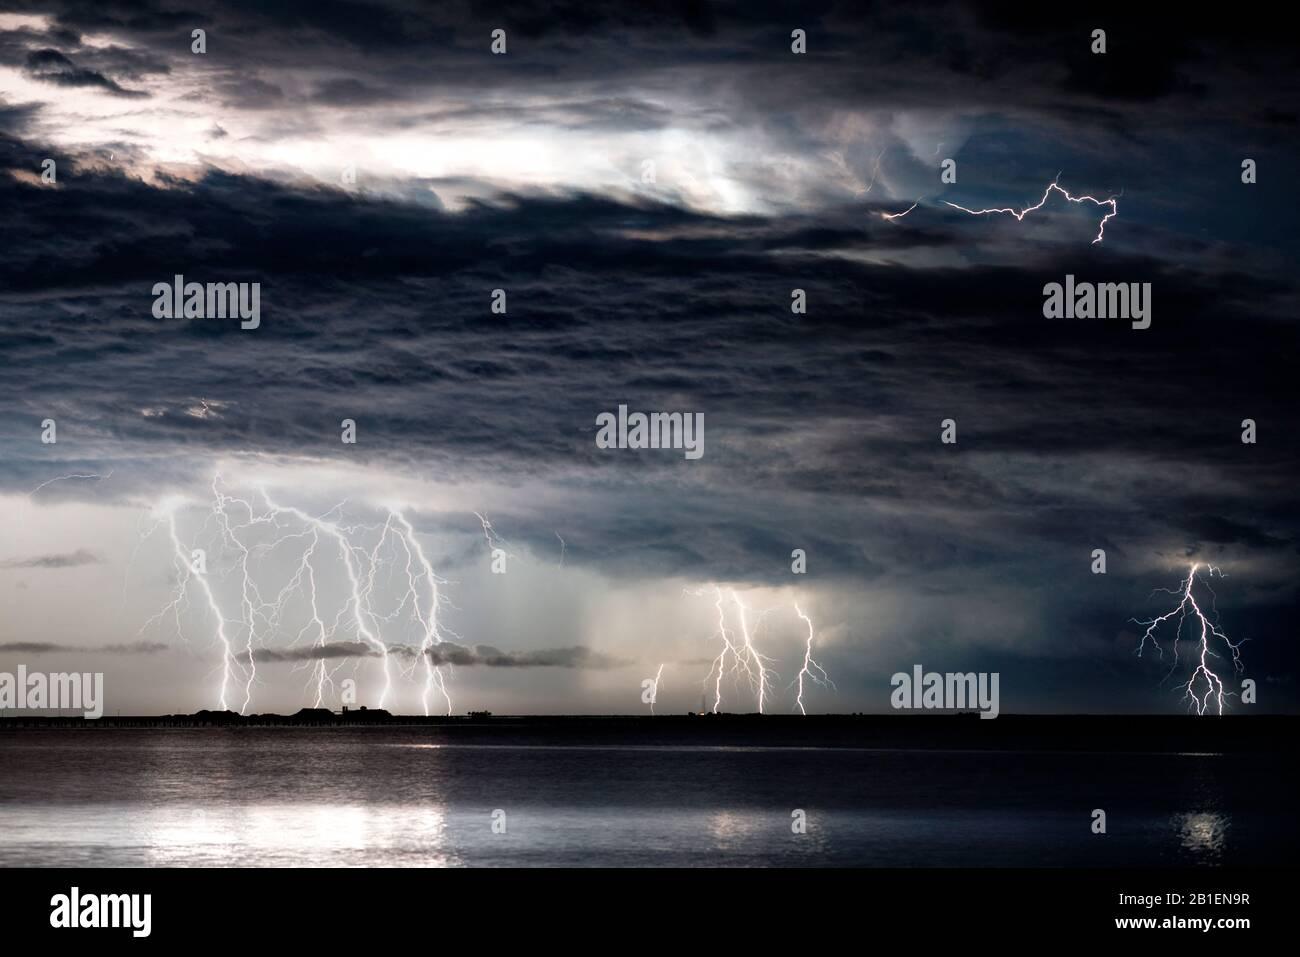 Thunderstorm in the Mediterranean off Tarragona the night of August 9-10, 2016, Sant Carle de la Rapita, Ebro Delta, Tarragona, Spain Stock Photo